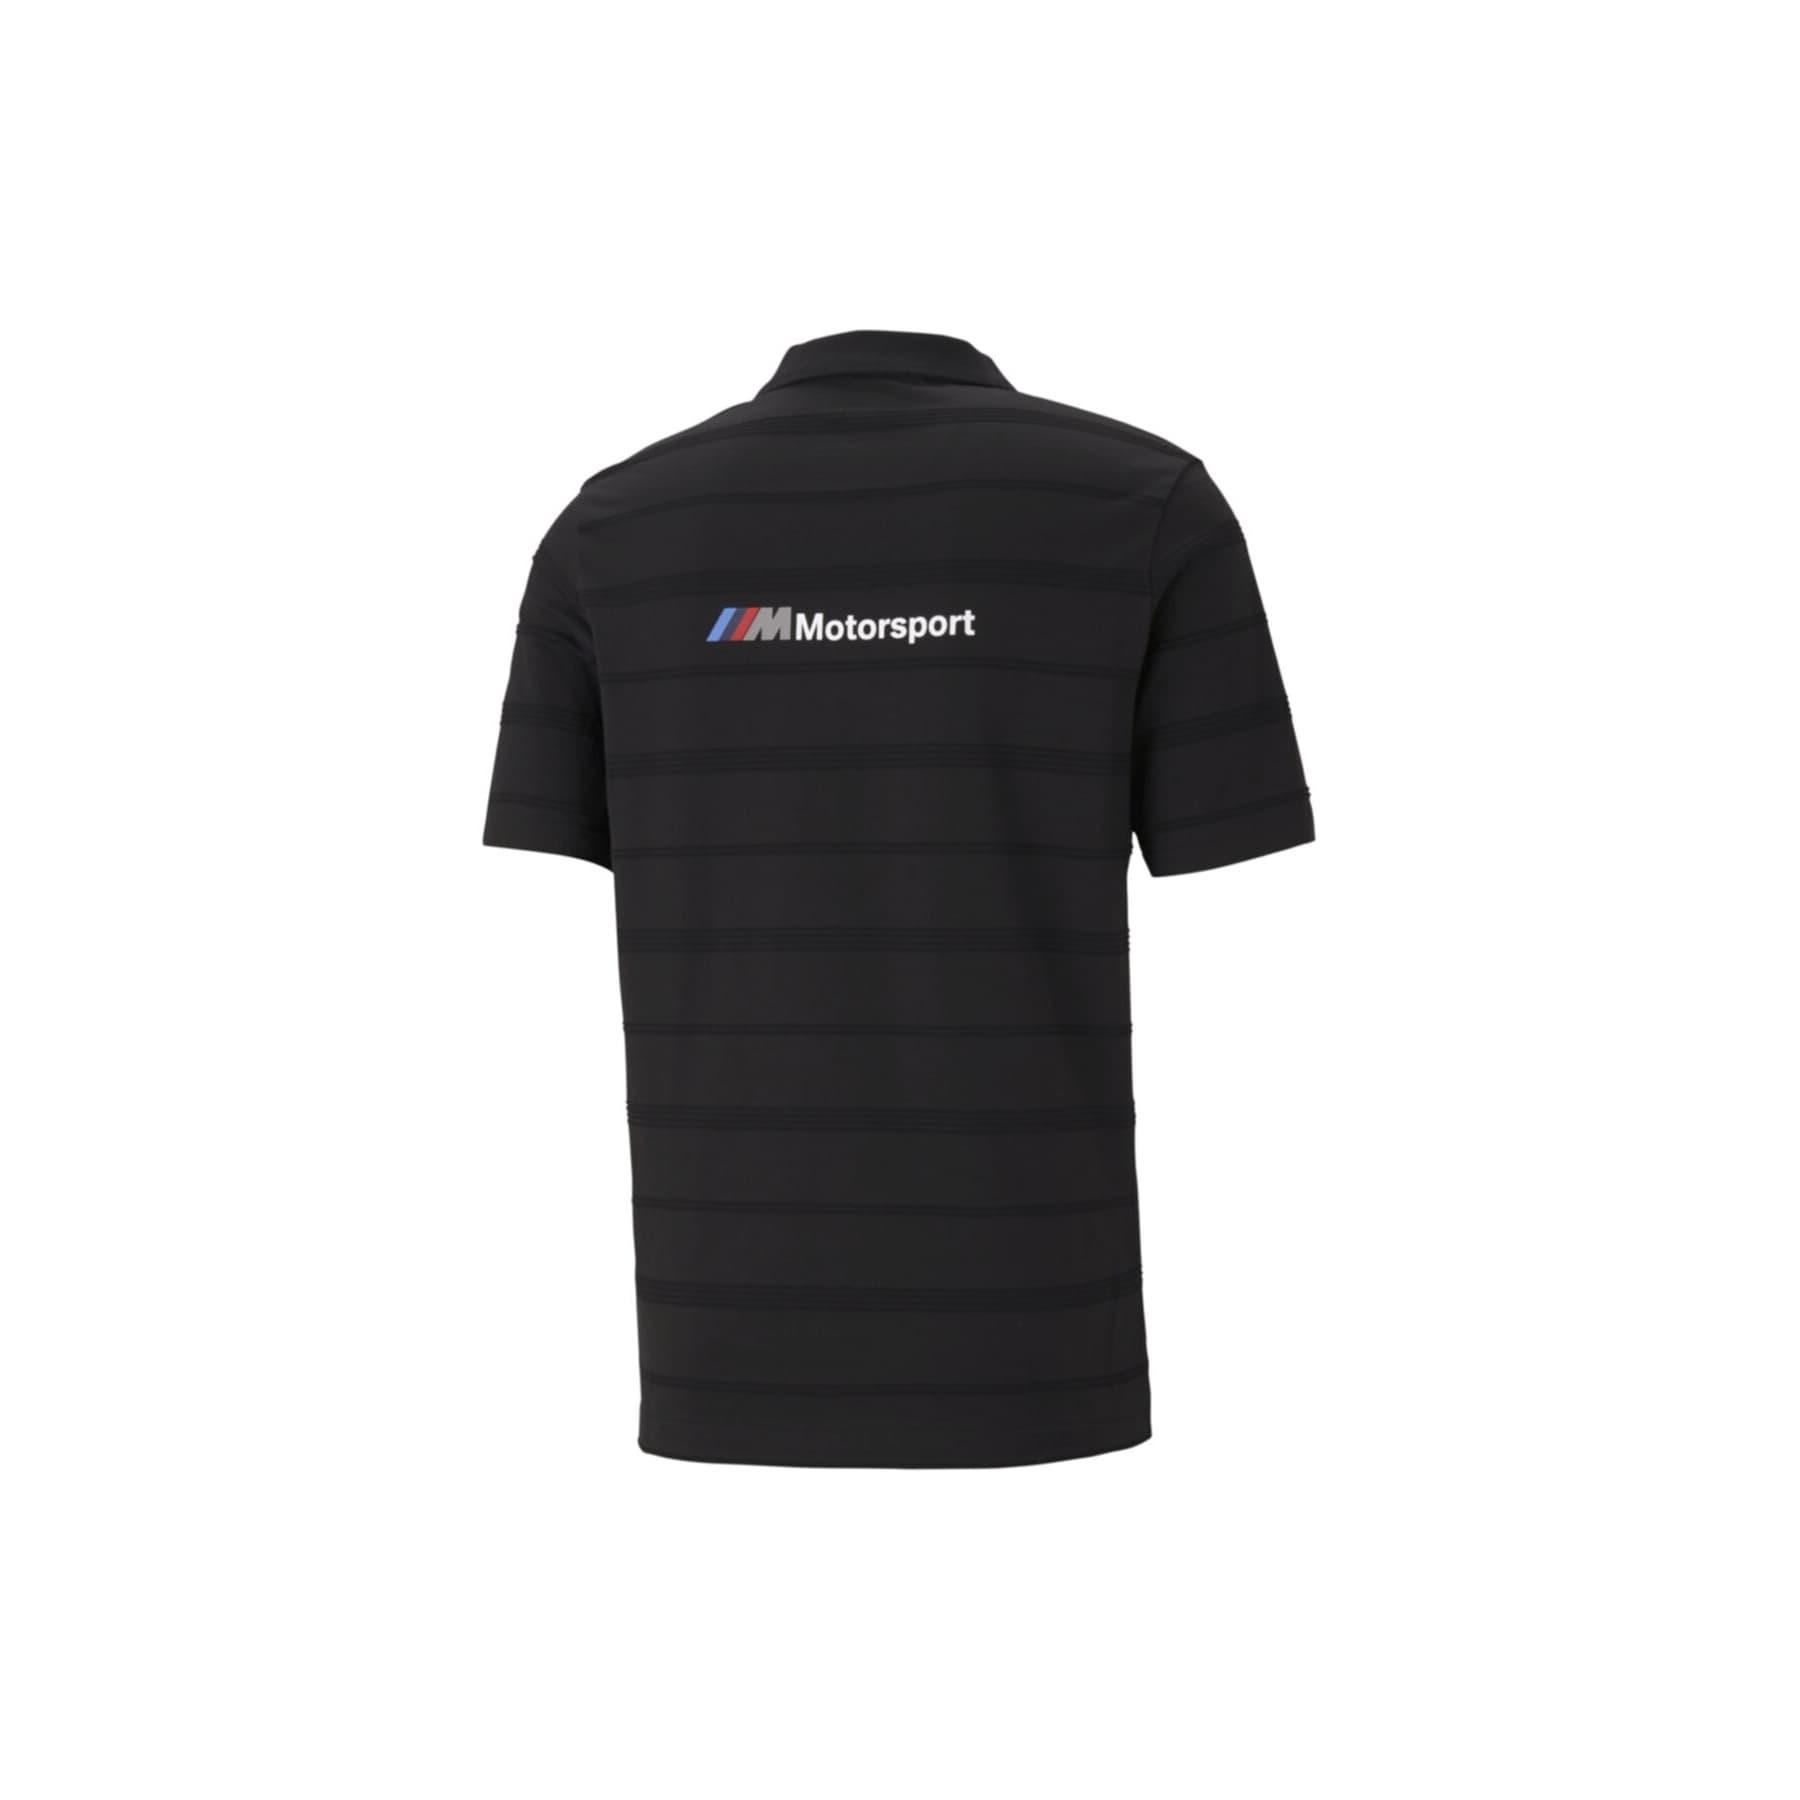 Bmw M Motorsport Striped Erkek Siyah Tişört (599524-01)